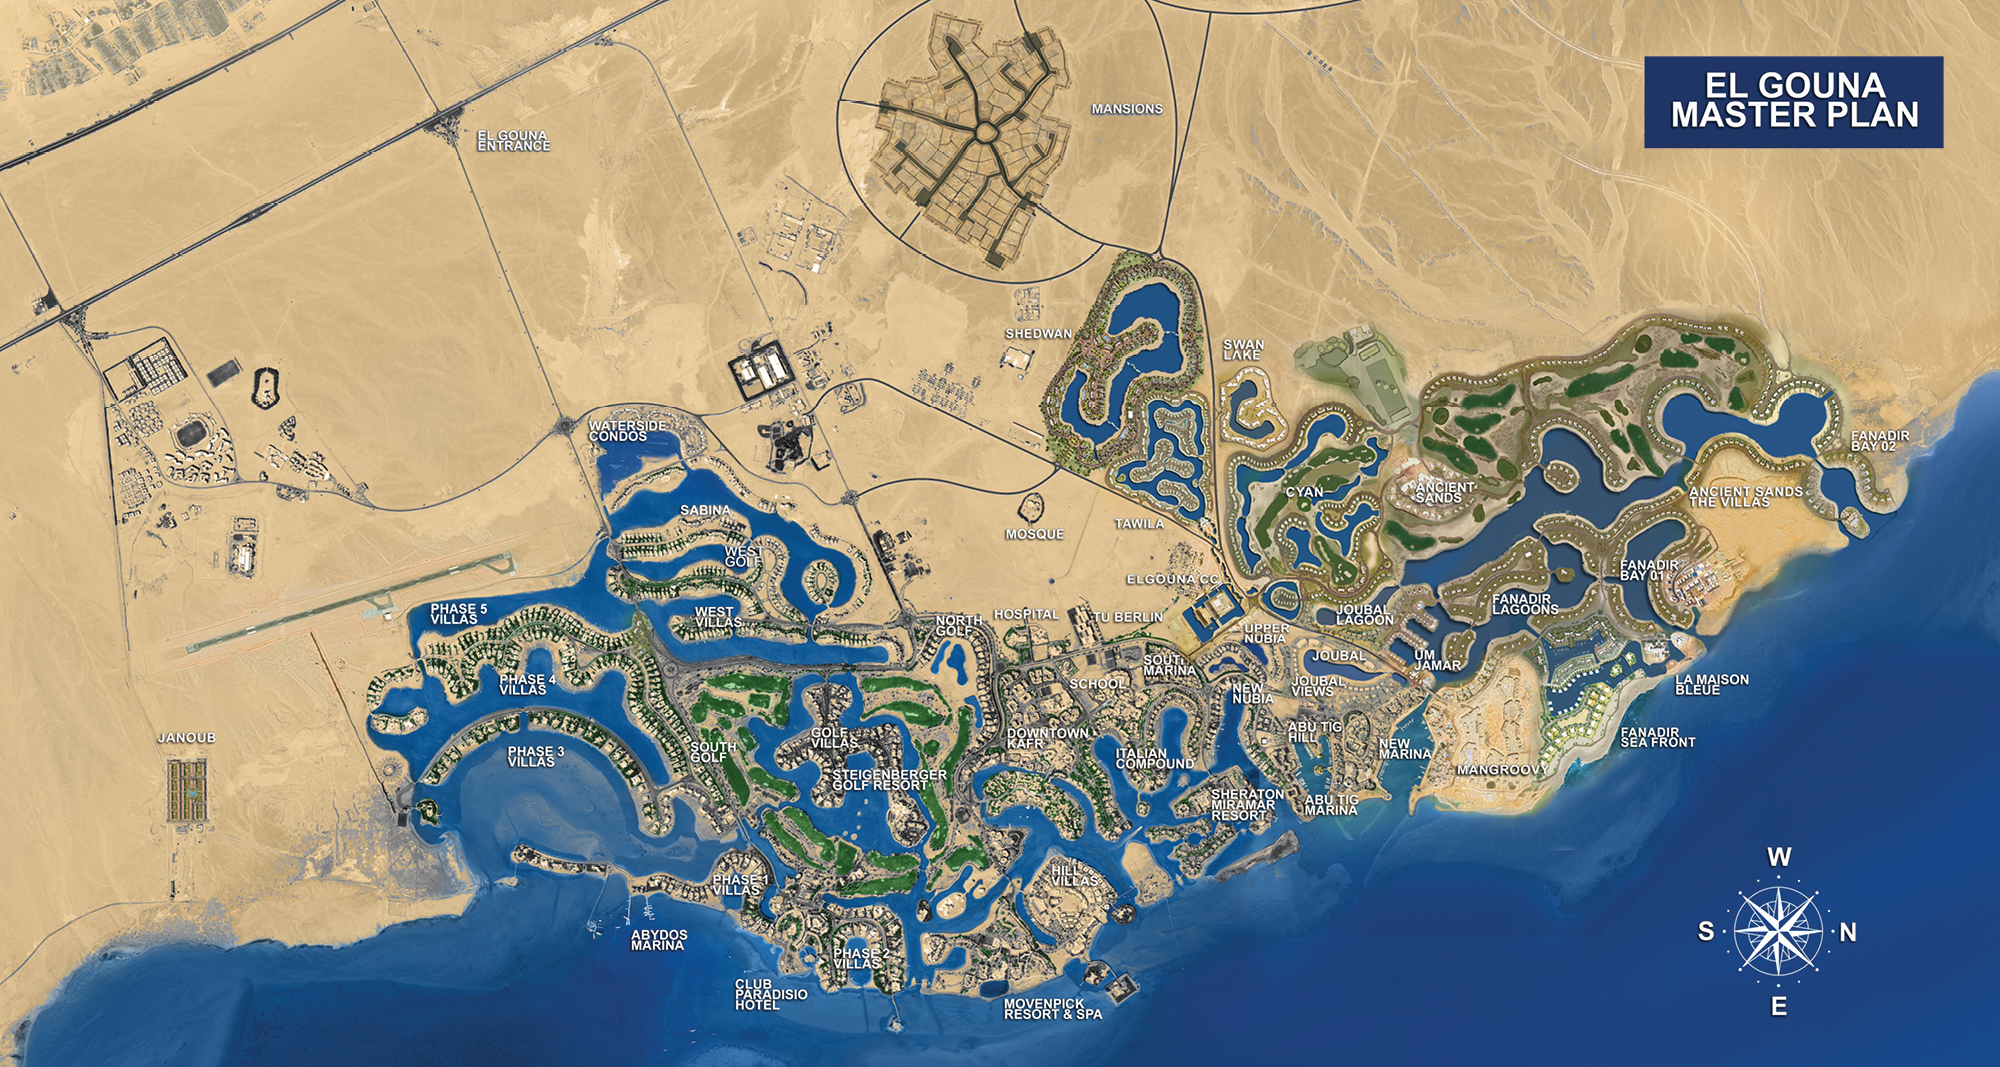 El Gouna Official Website Properties For Sale At El Gouna - Map of egypt el gouna